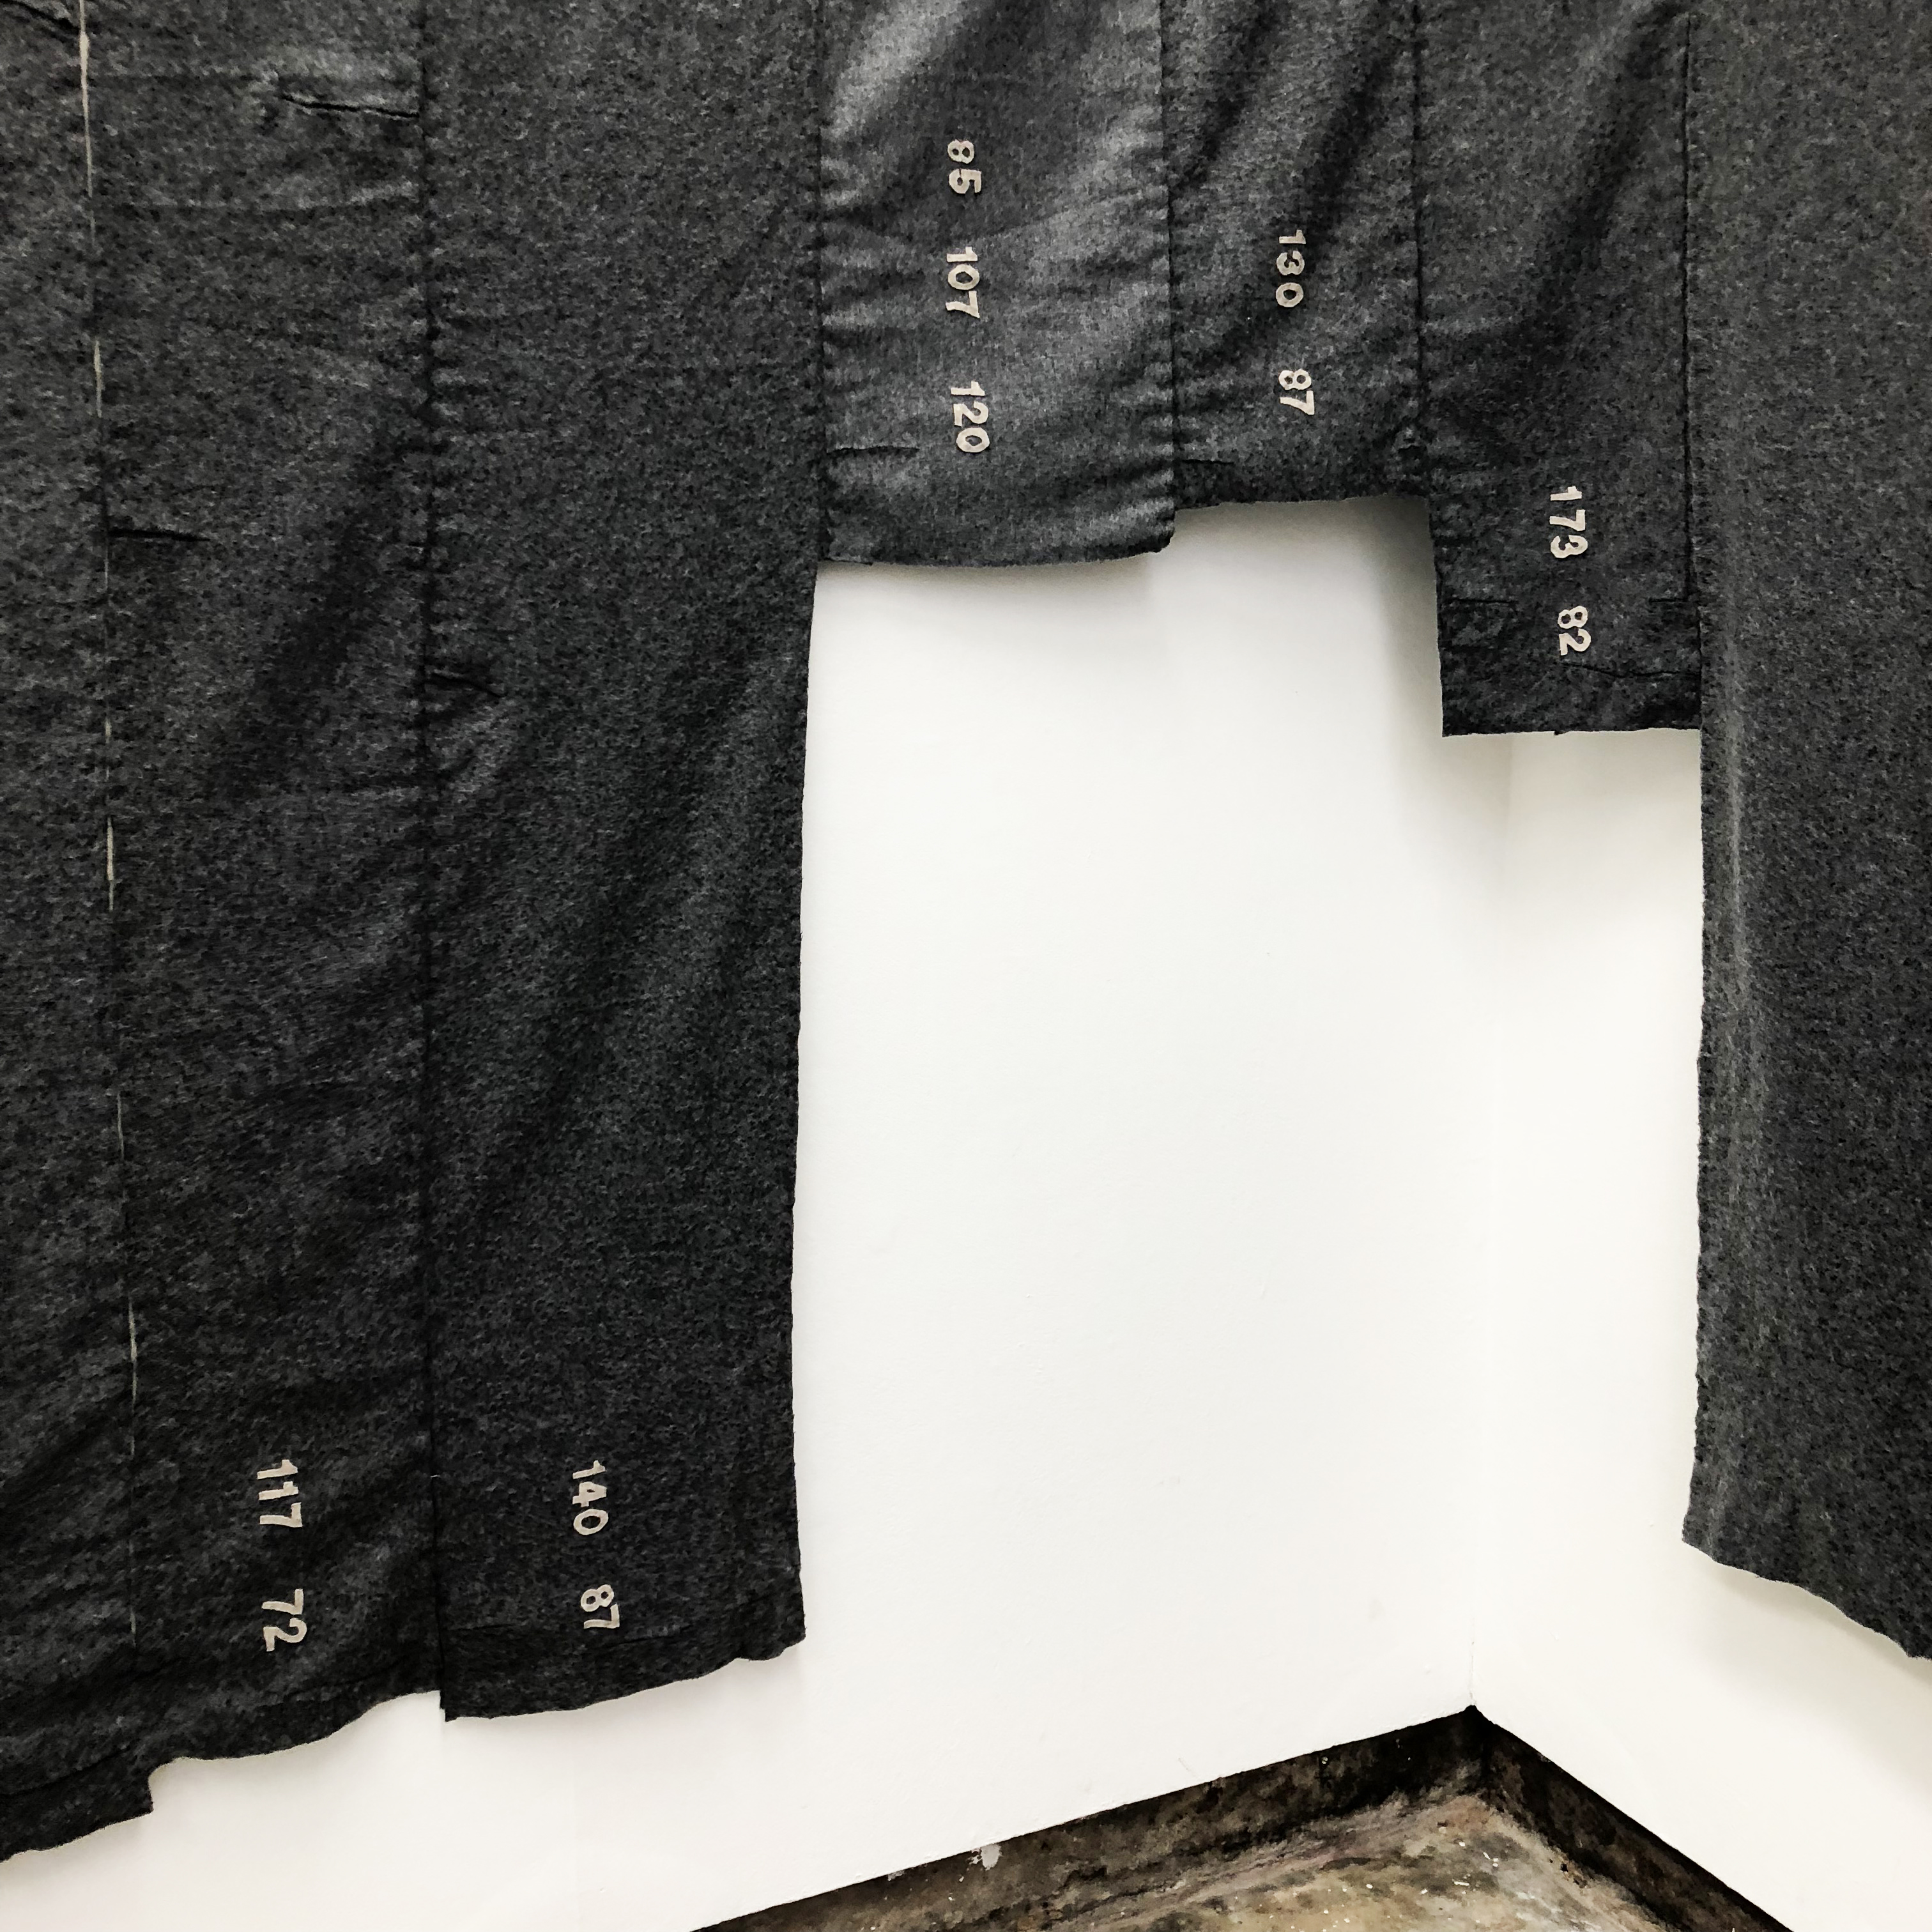 Blanket Work modifed